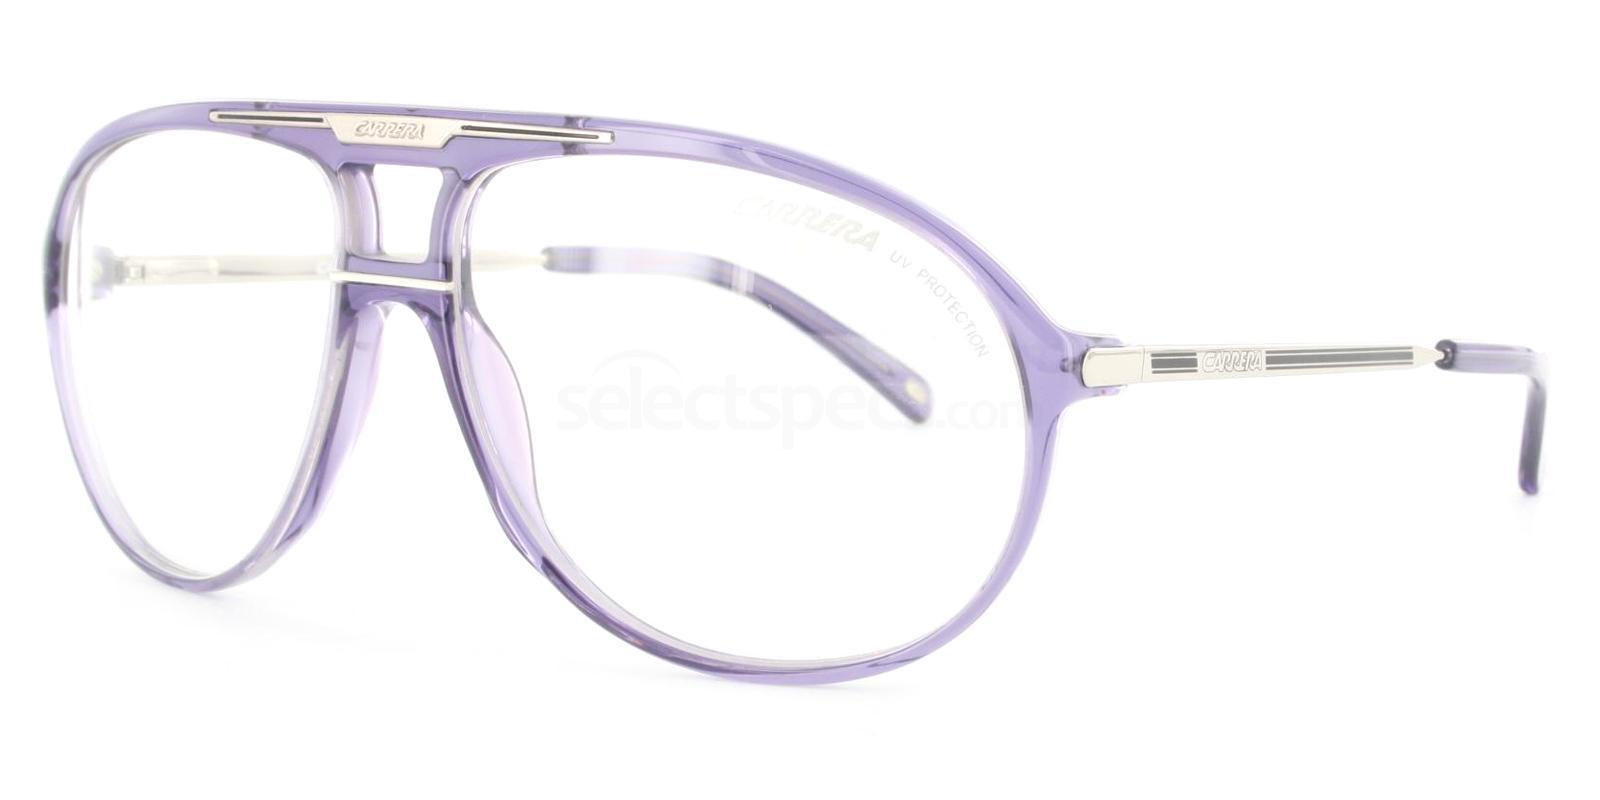 VE4 (99) MASTER 1 Sunglasses, Carrera